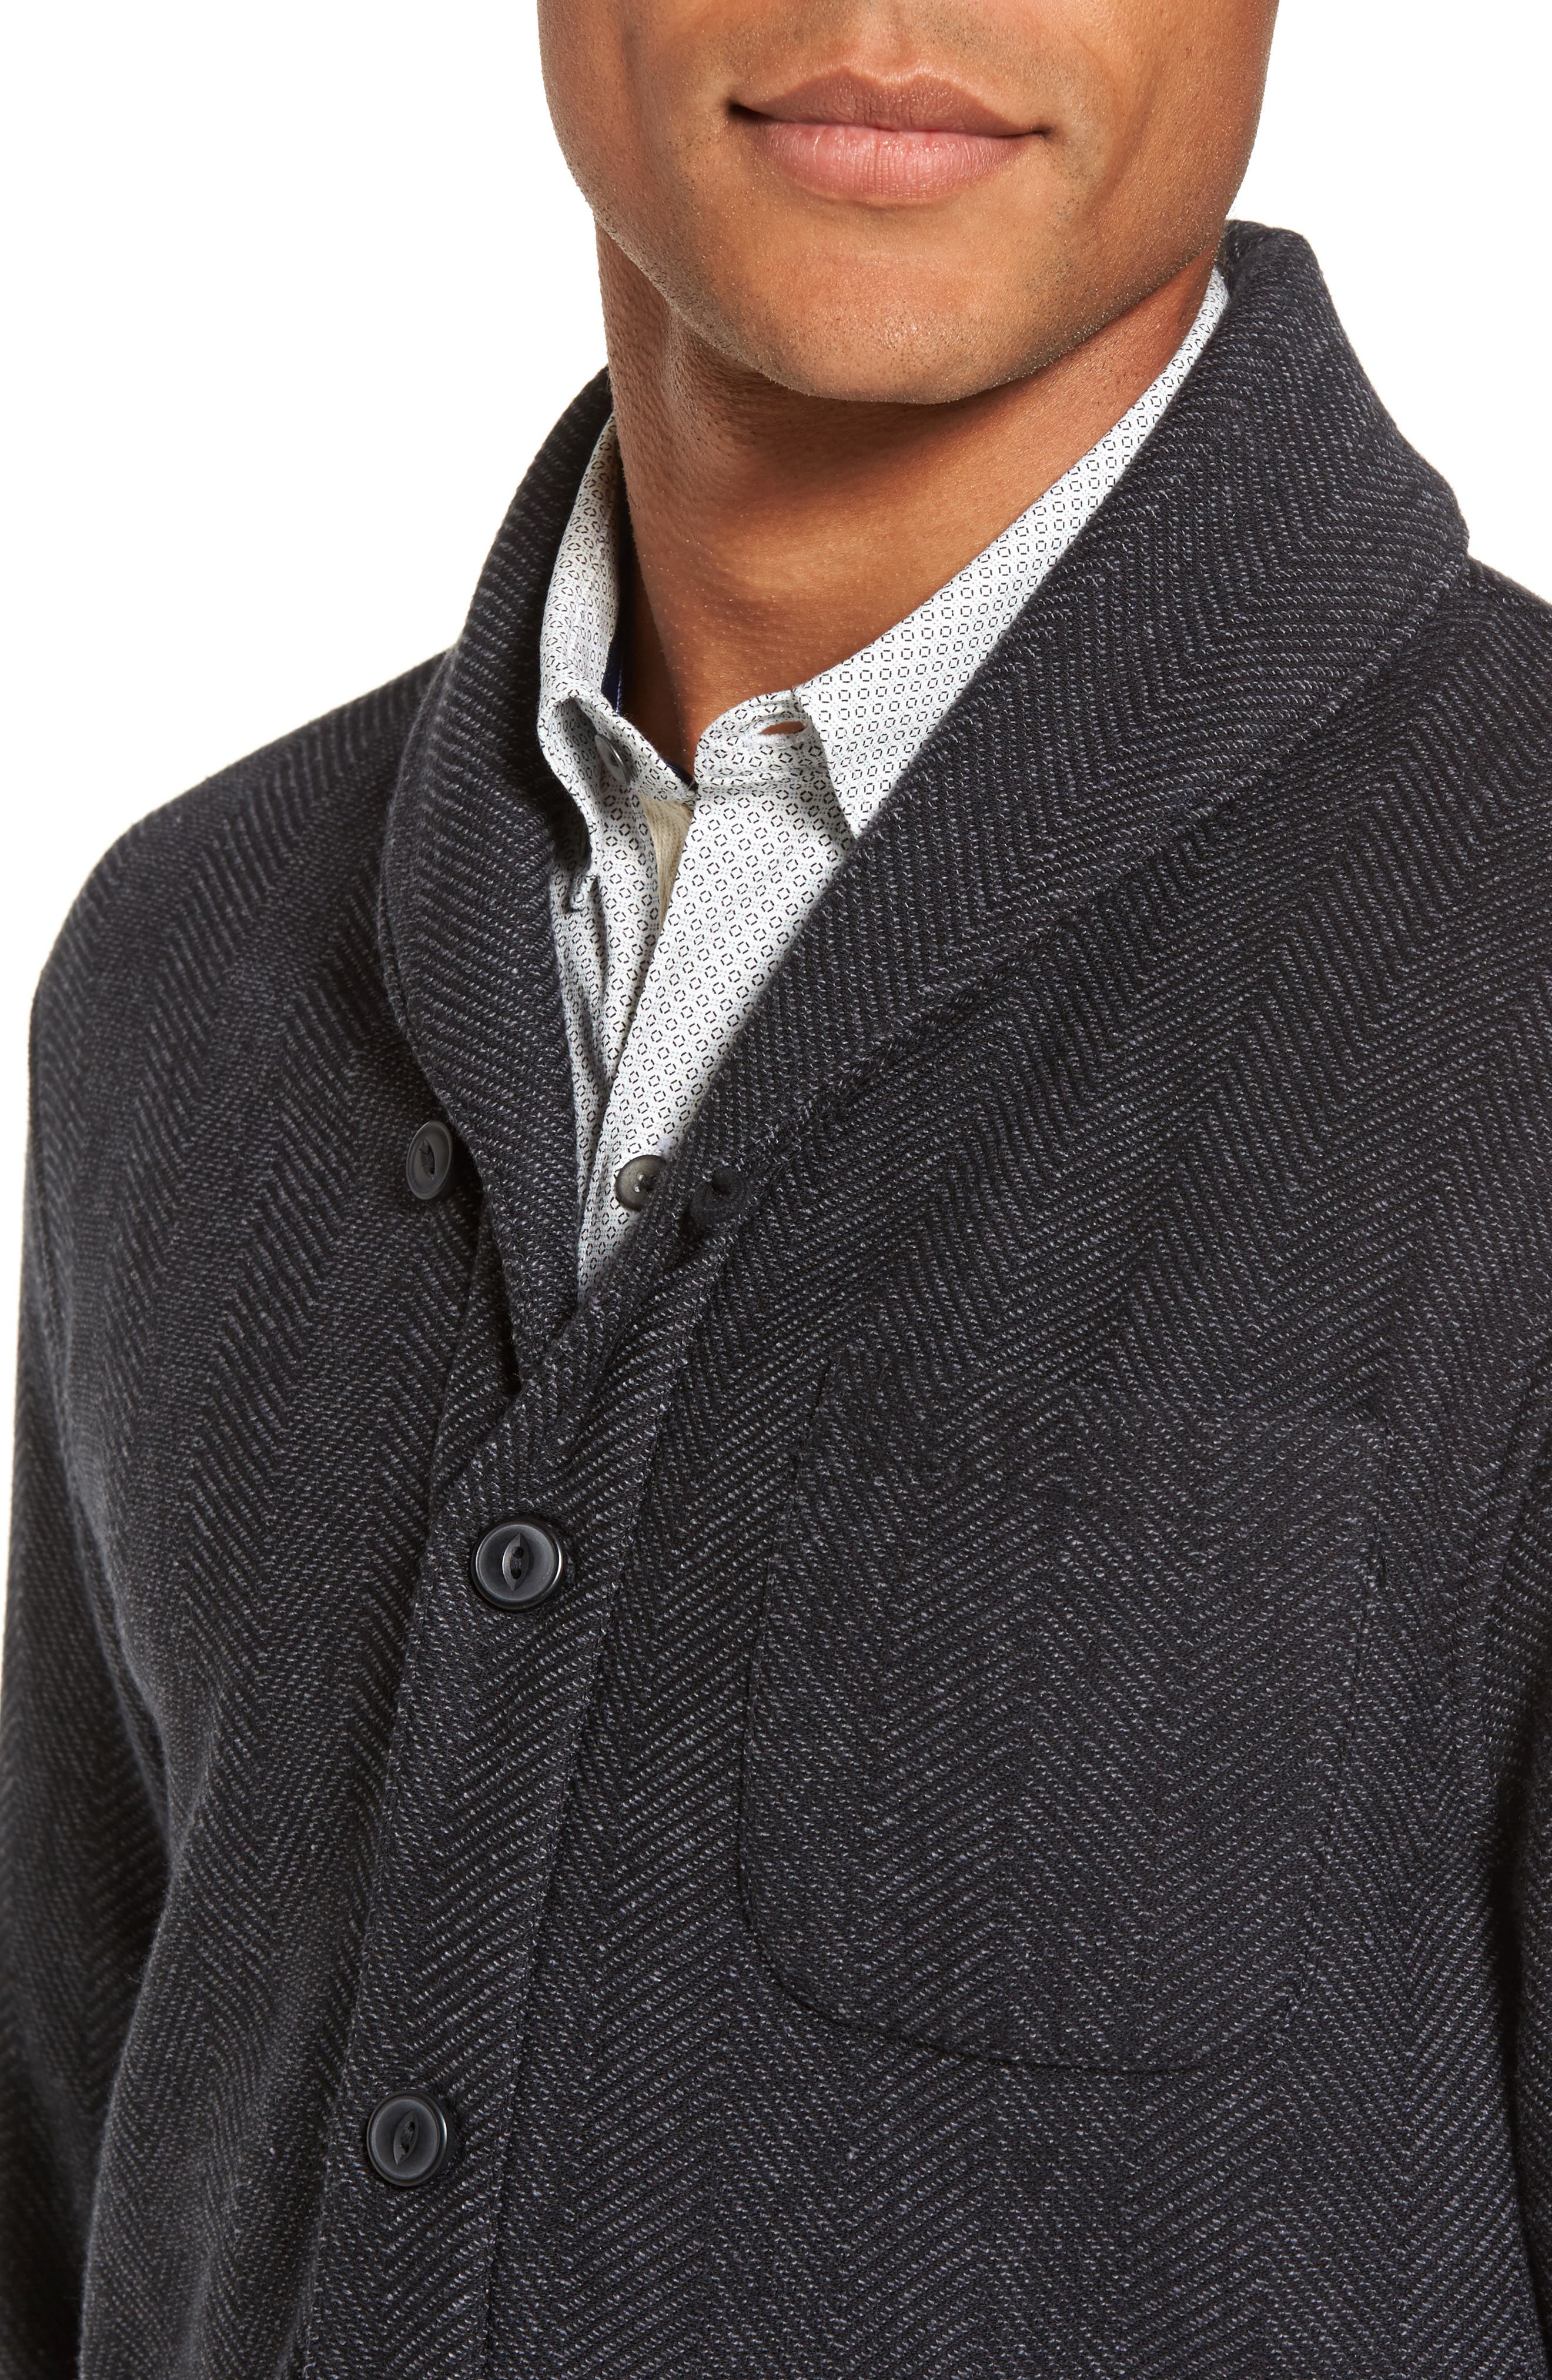 Alternate Image 4  - Nordstrom Men's Shop Fleece Lined Shawl Collar Cardigan